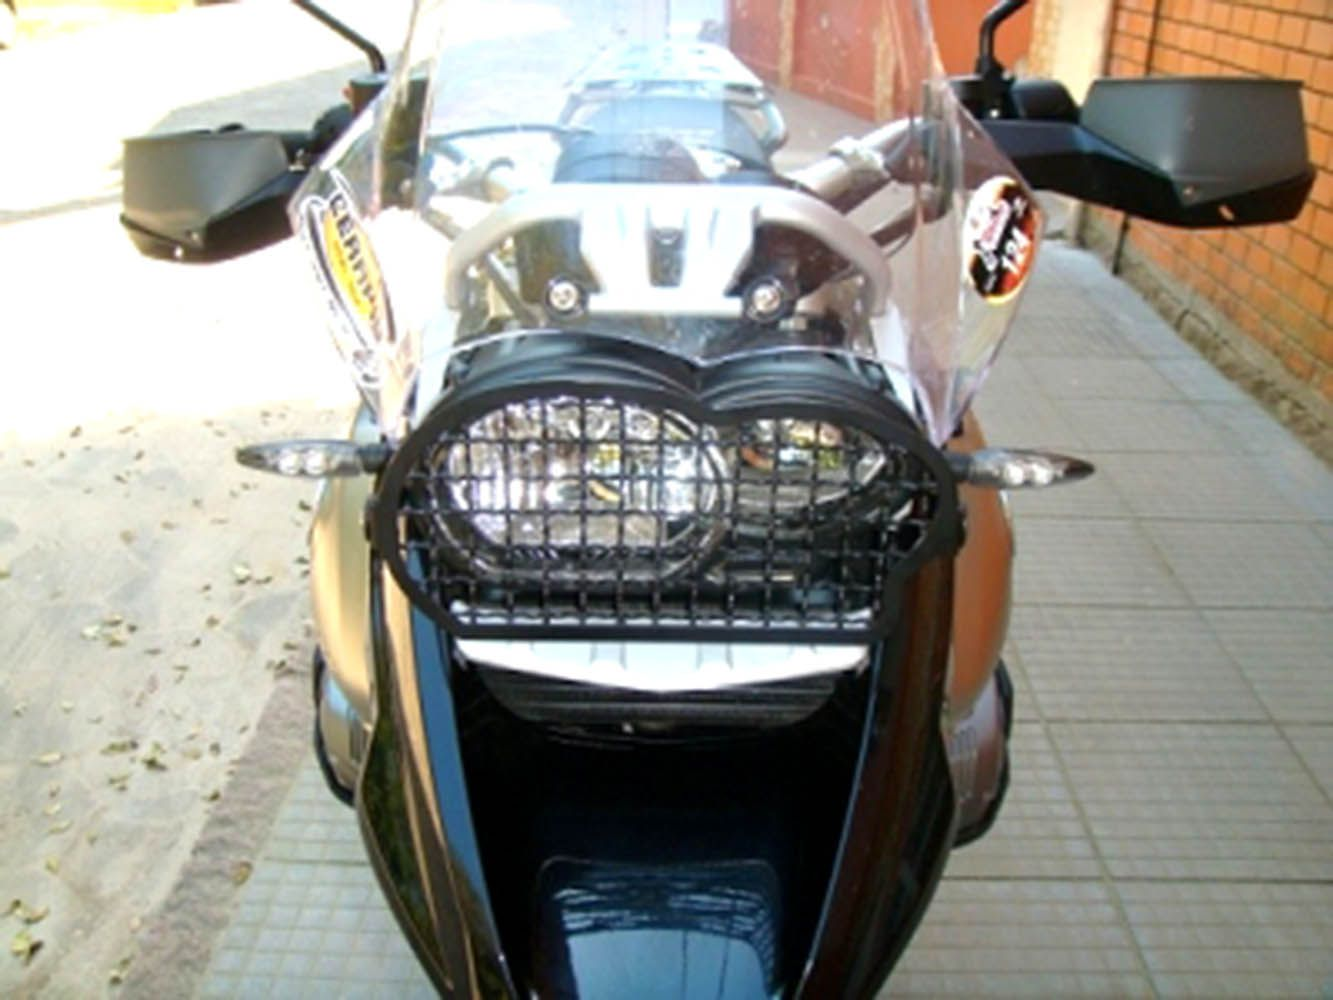 Protetor Grade Farol R 1200 GS Bmw Preto Fosco 4529 Chapam